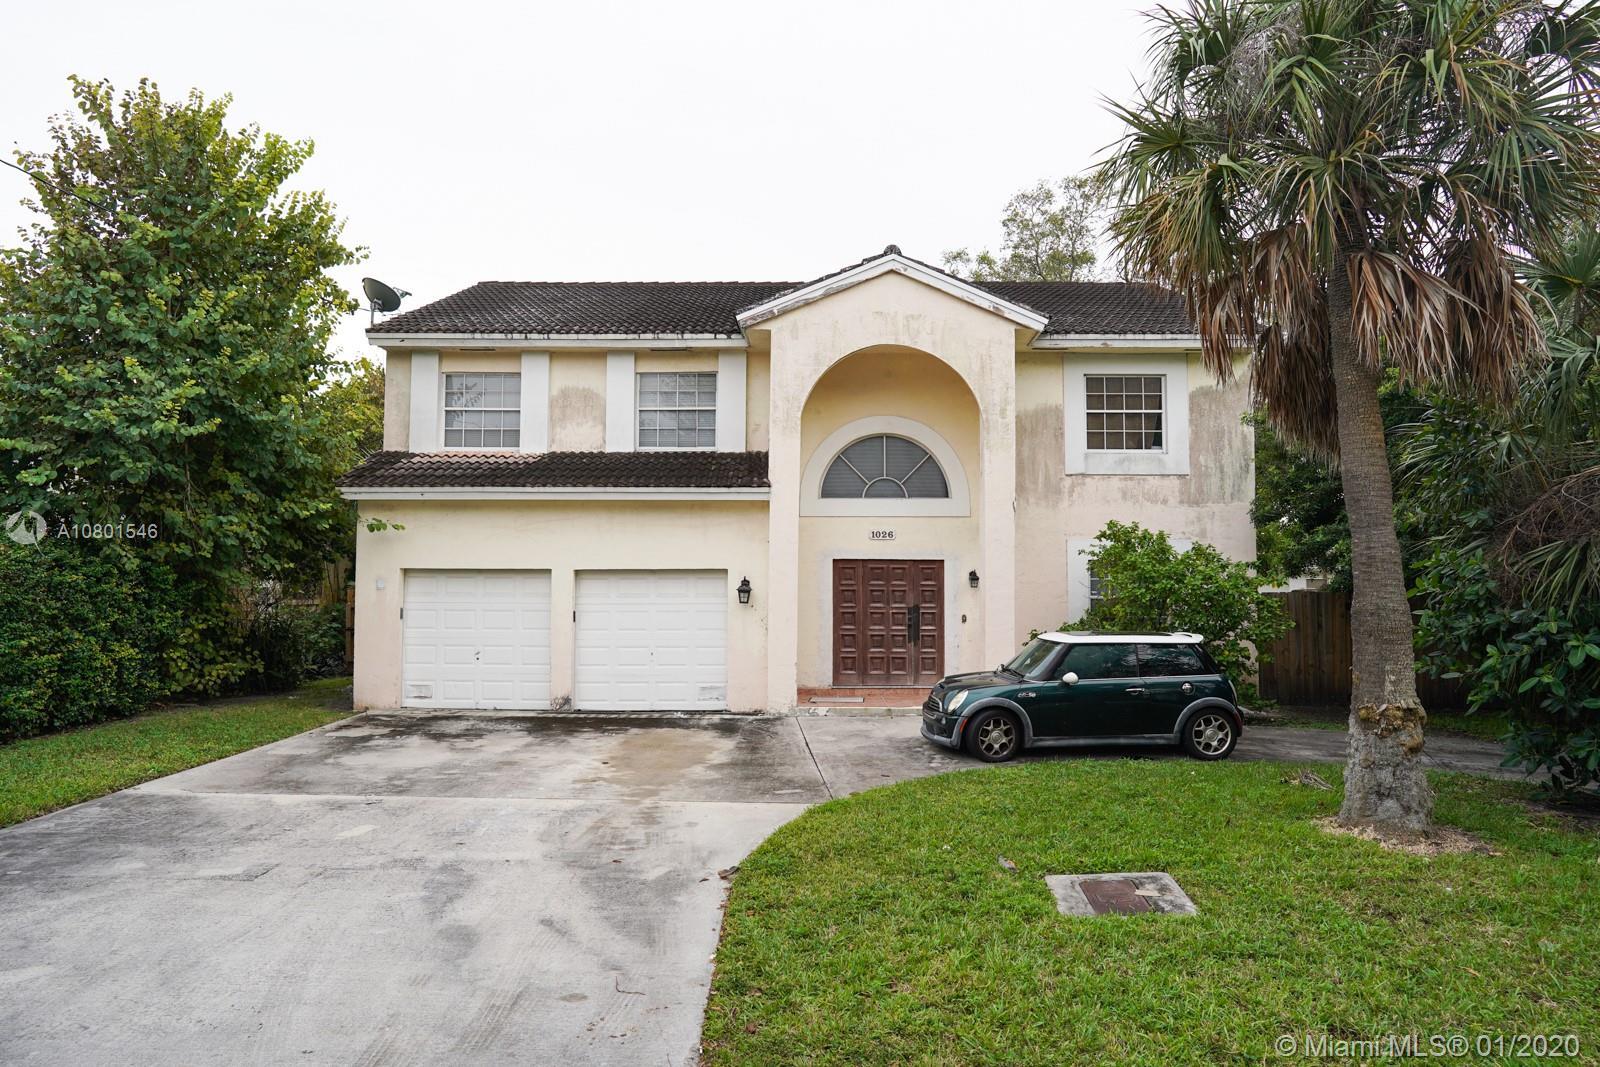 1026 NE 88th St - Miami, Florida